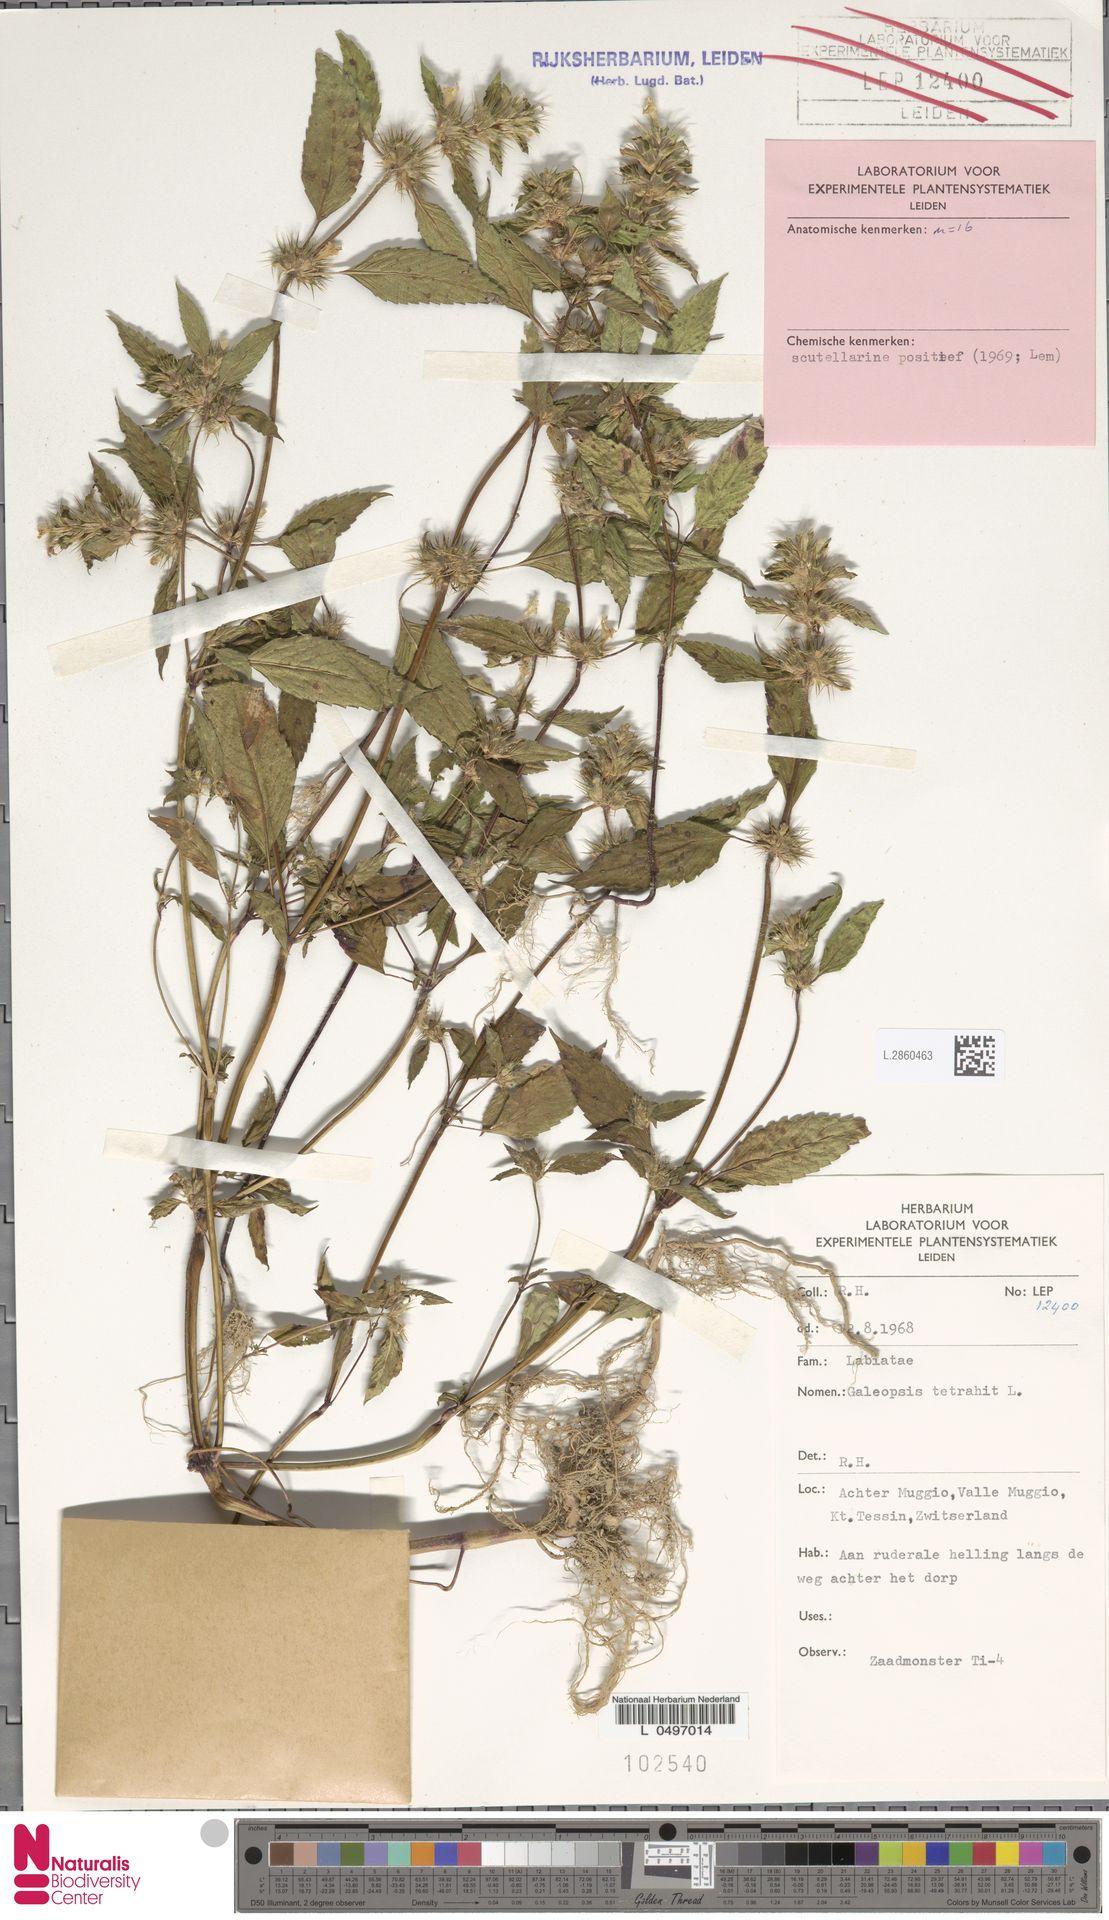 L.2860463   Galeopsis tetrahit L.